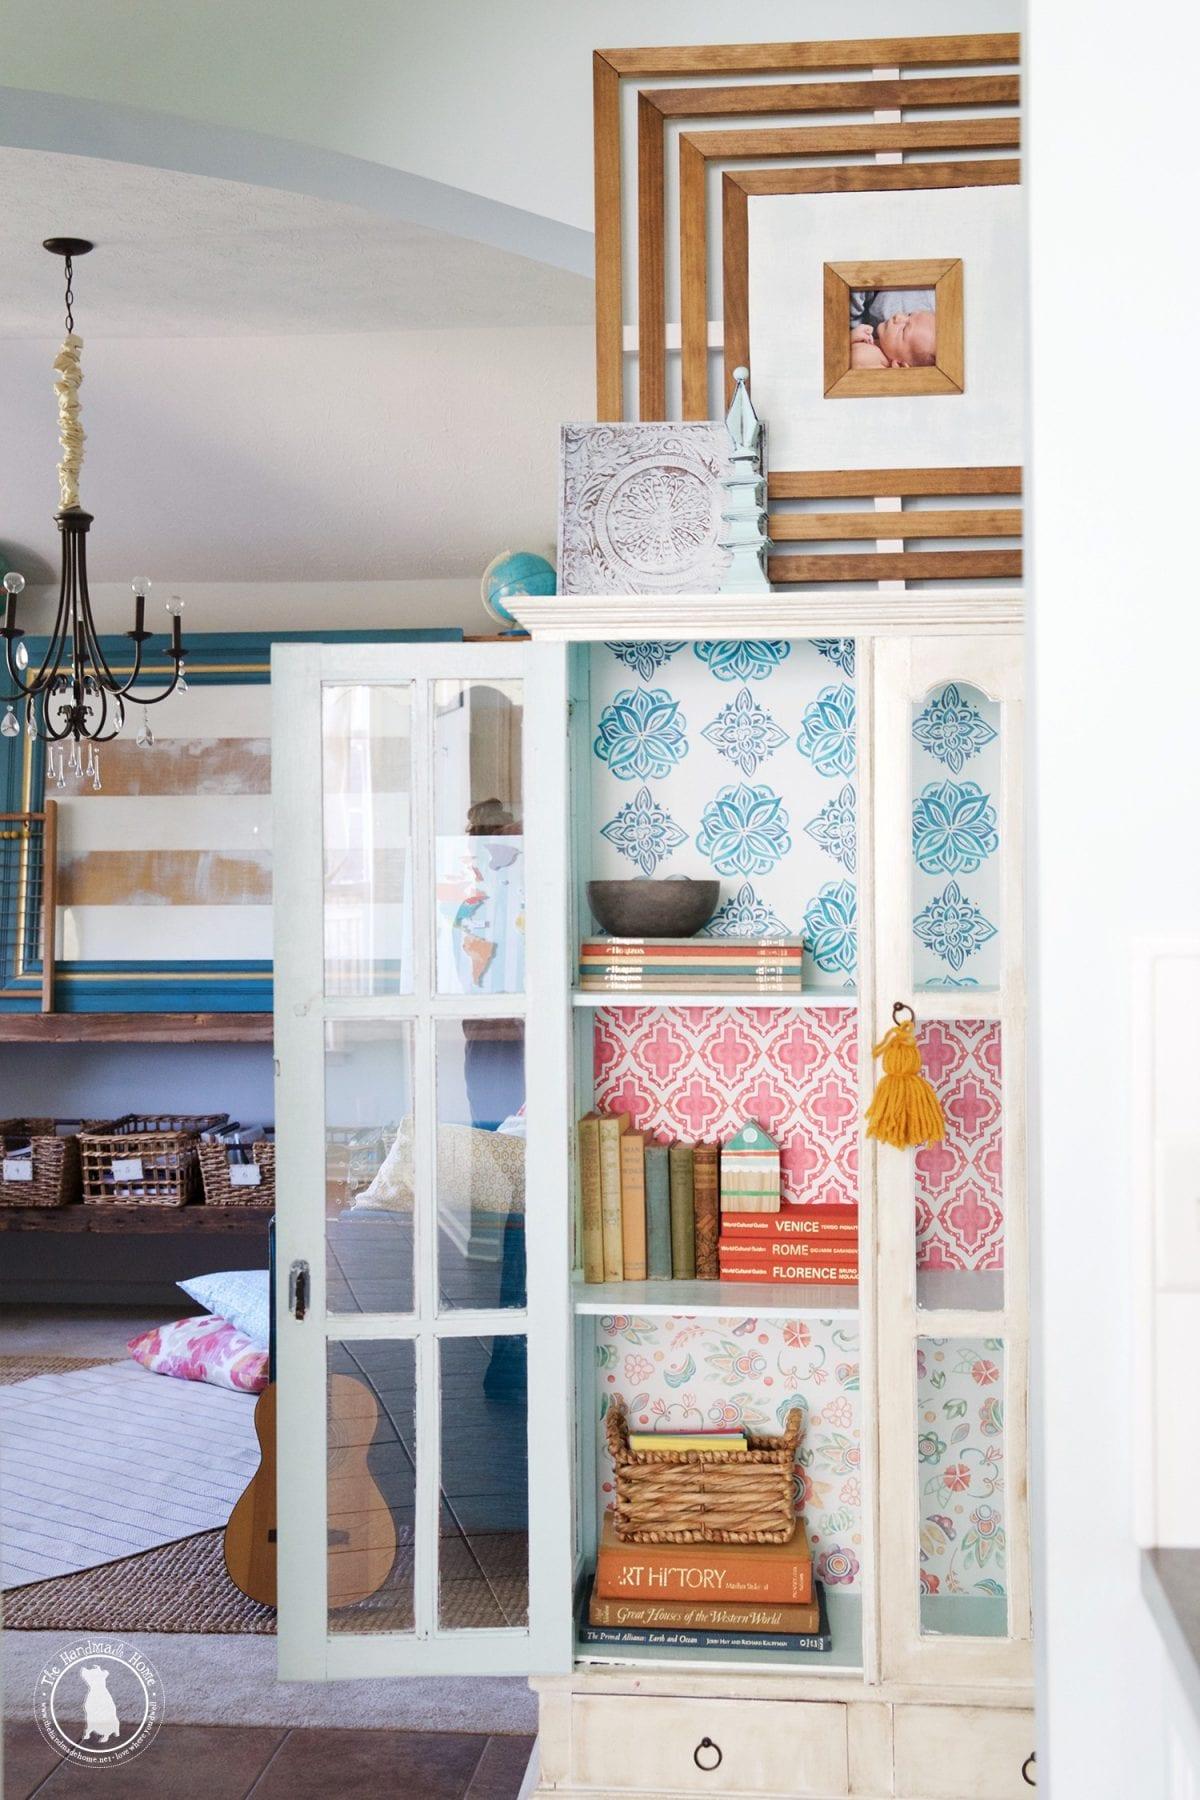 wallpaper_the_handmade_home 2